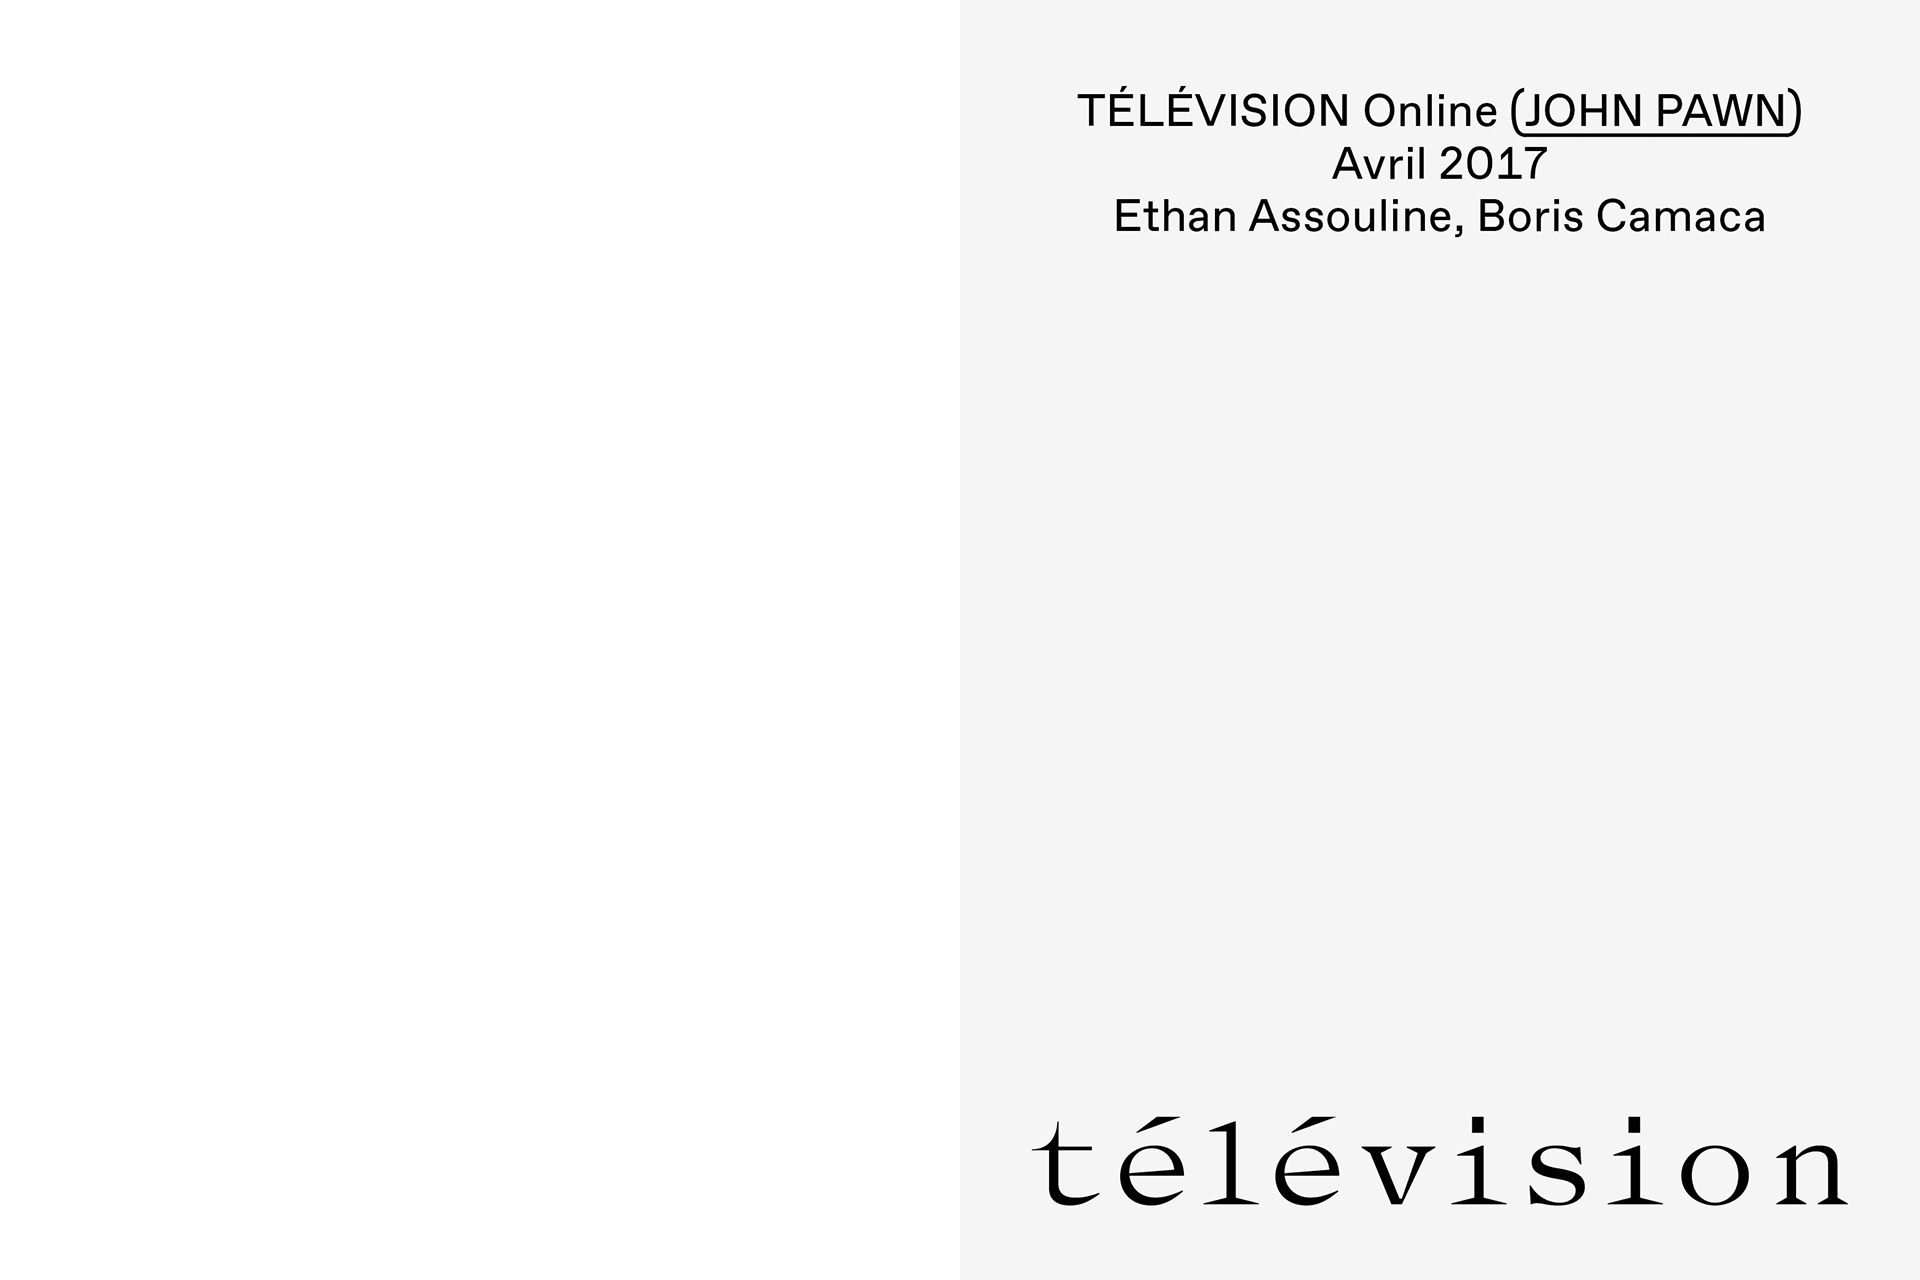 Télévision OL 1701 BC 010 047 JOHNPAWN (EA, BC, MG)